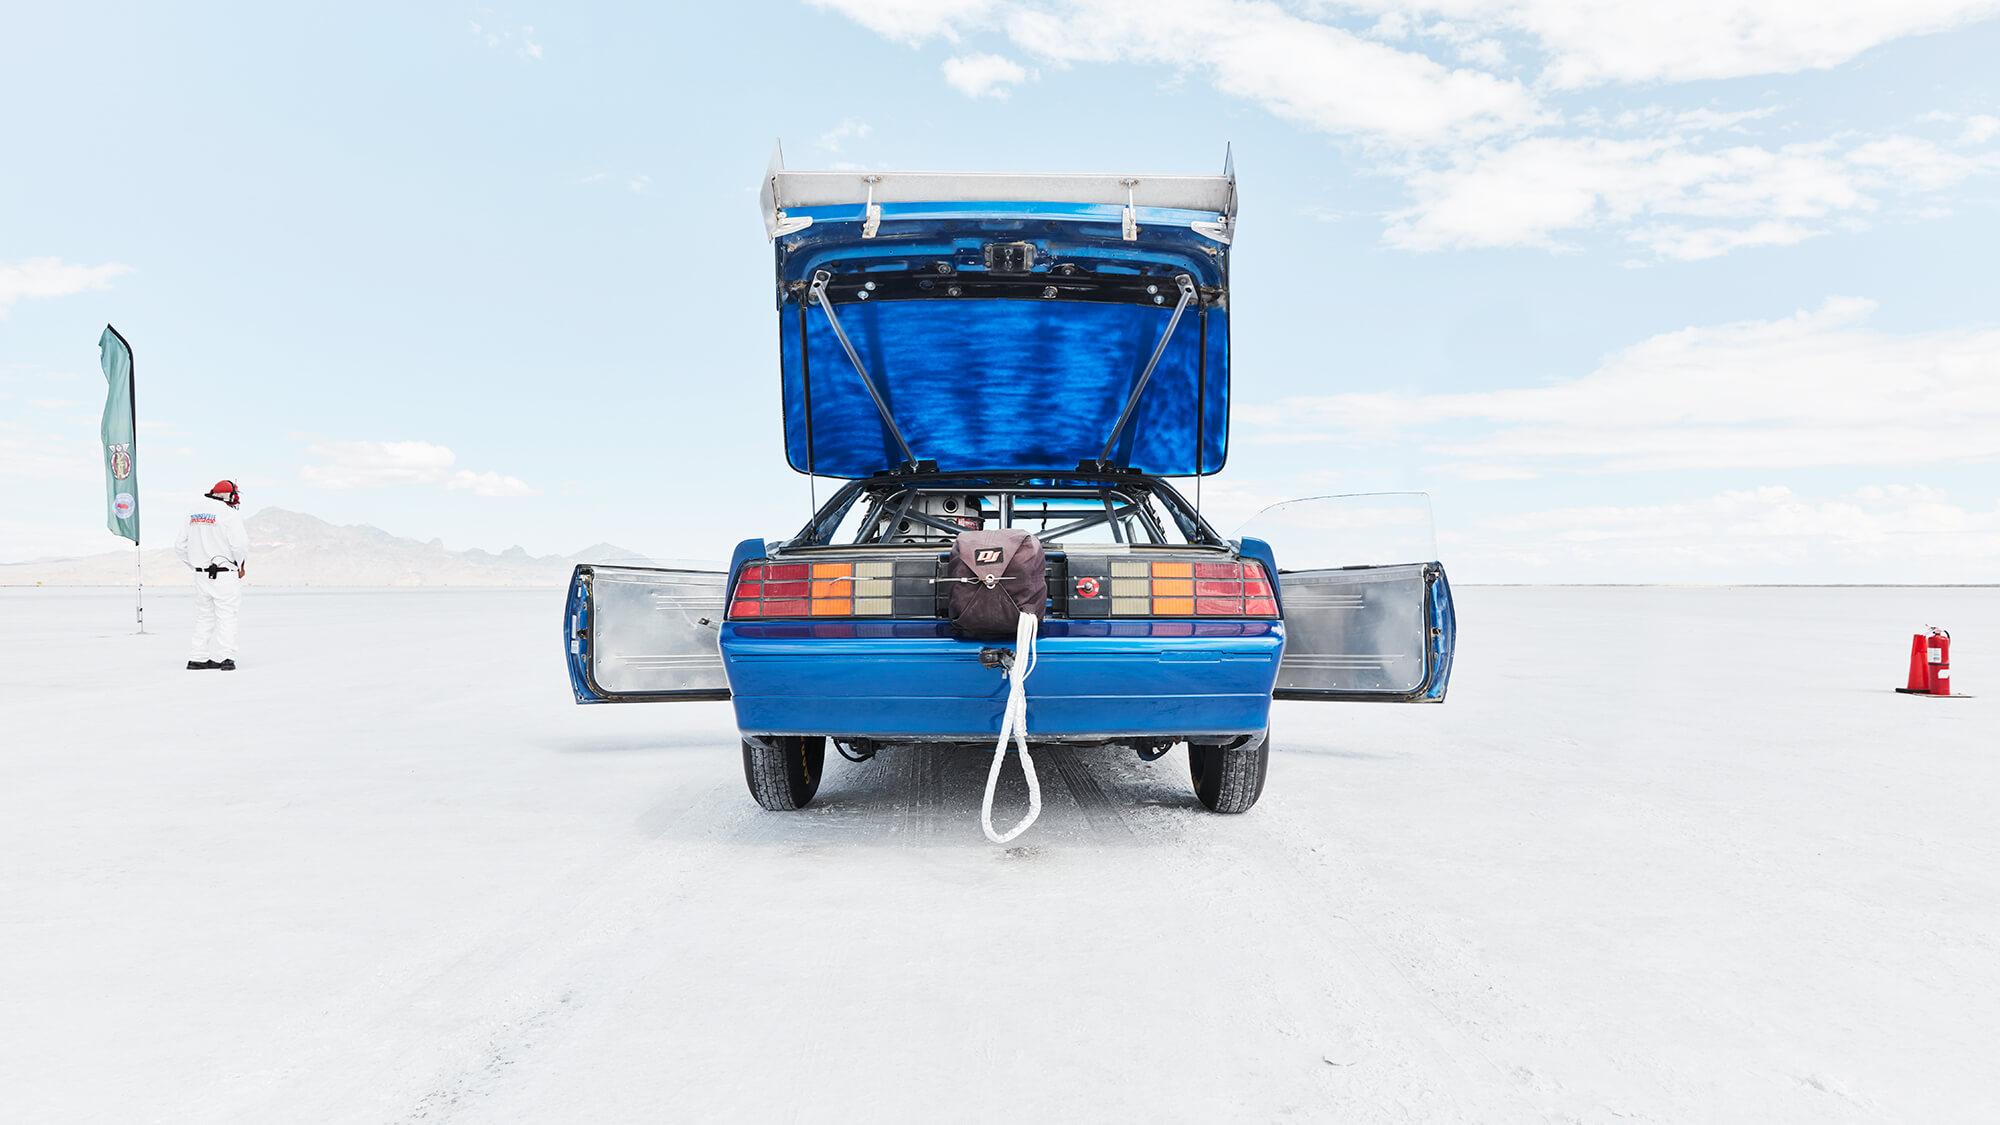 Unified Content, Aaron Cobb, Bonneville, Cars, photography, Travel, Series, Racing, Drag racing, Bonneville, Bonneville cars, bonneville car racing, production, toronto, toronto production